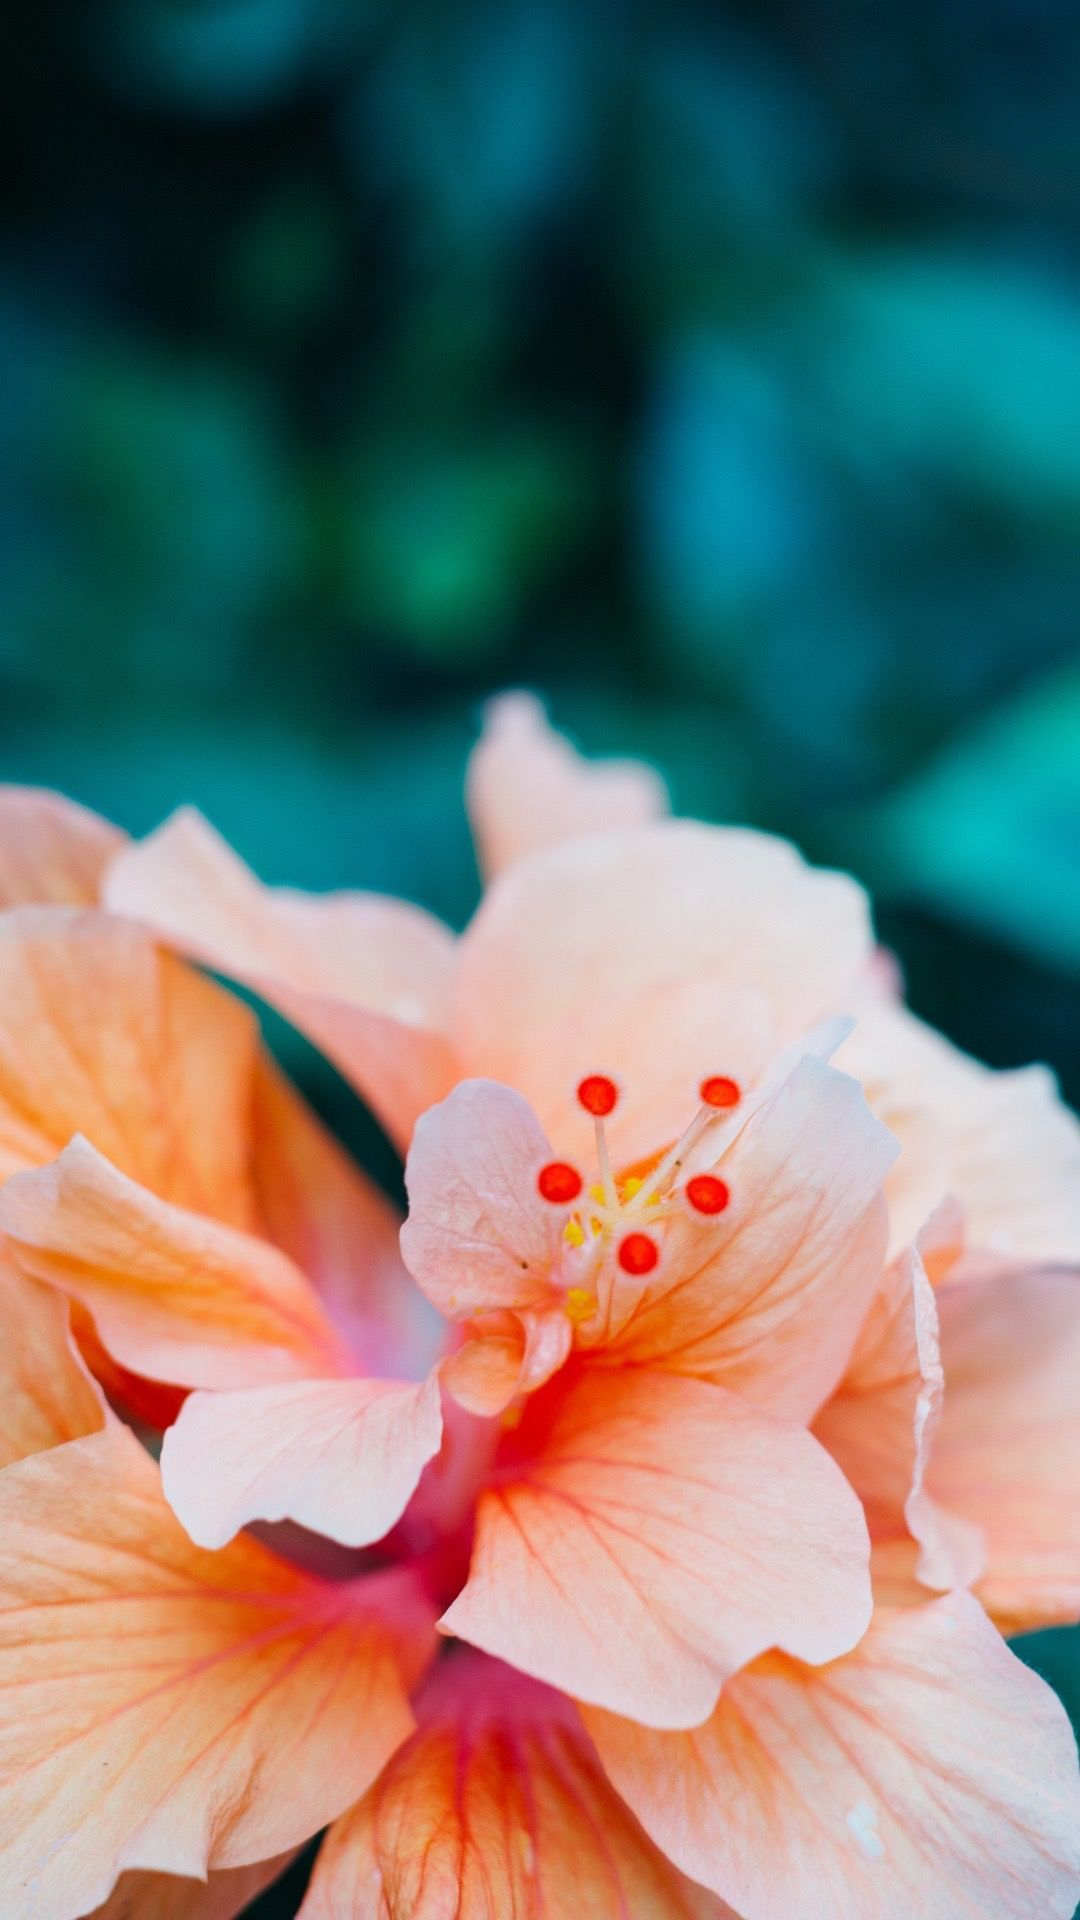 Hibiscus Flower Wallpaper For Iphone 3d Wallpapers Nature Iphone Wallpaper Flower Iphone Wallpaper Flower Wallpaper